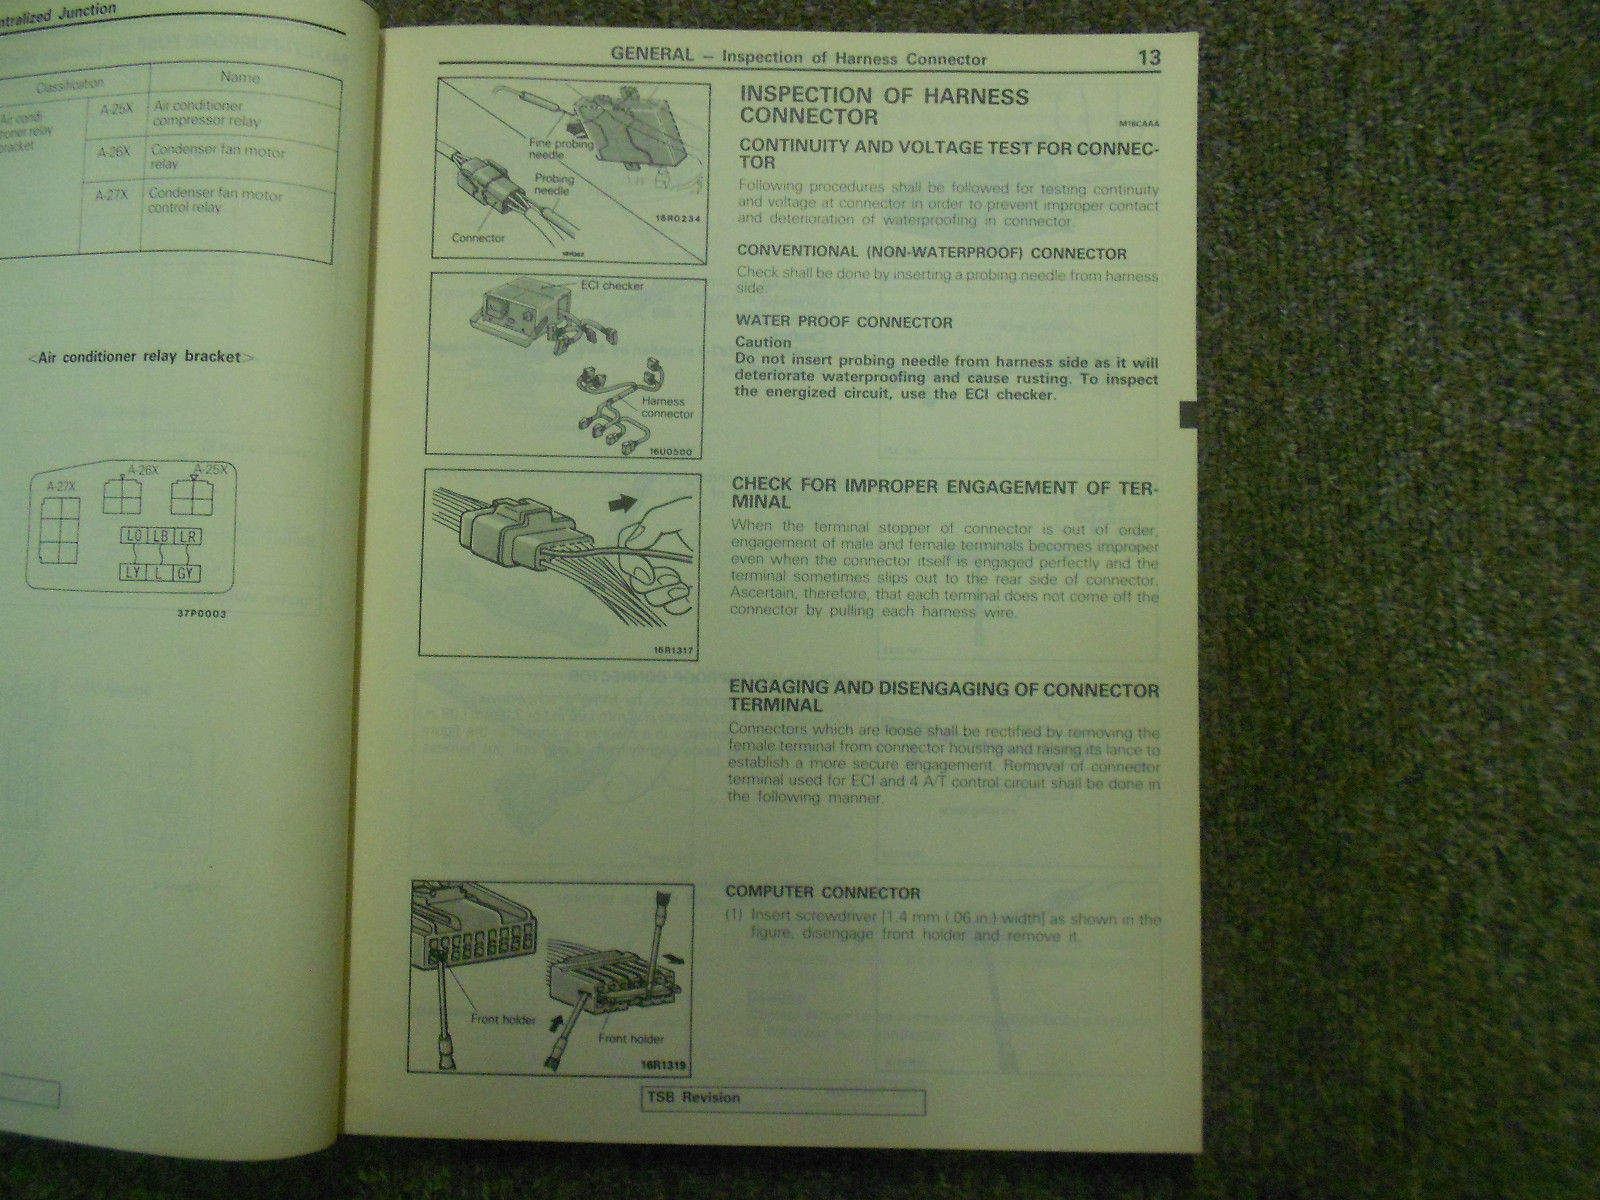 1990 MITSUBISHI Mirage Service Repair Shop Manual Volume 2 FACTORY OEM BOOK 90